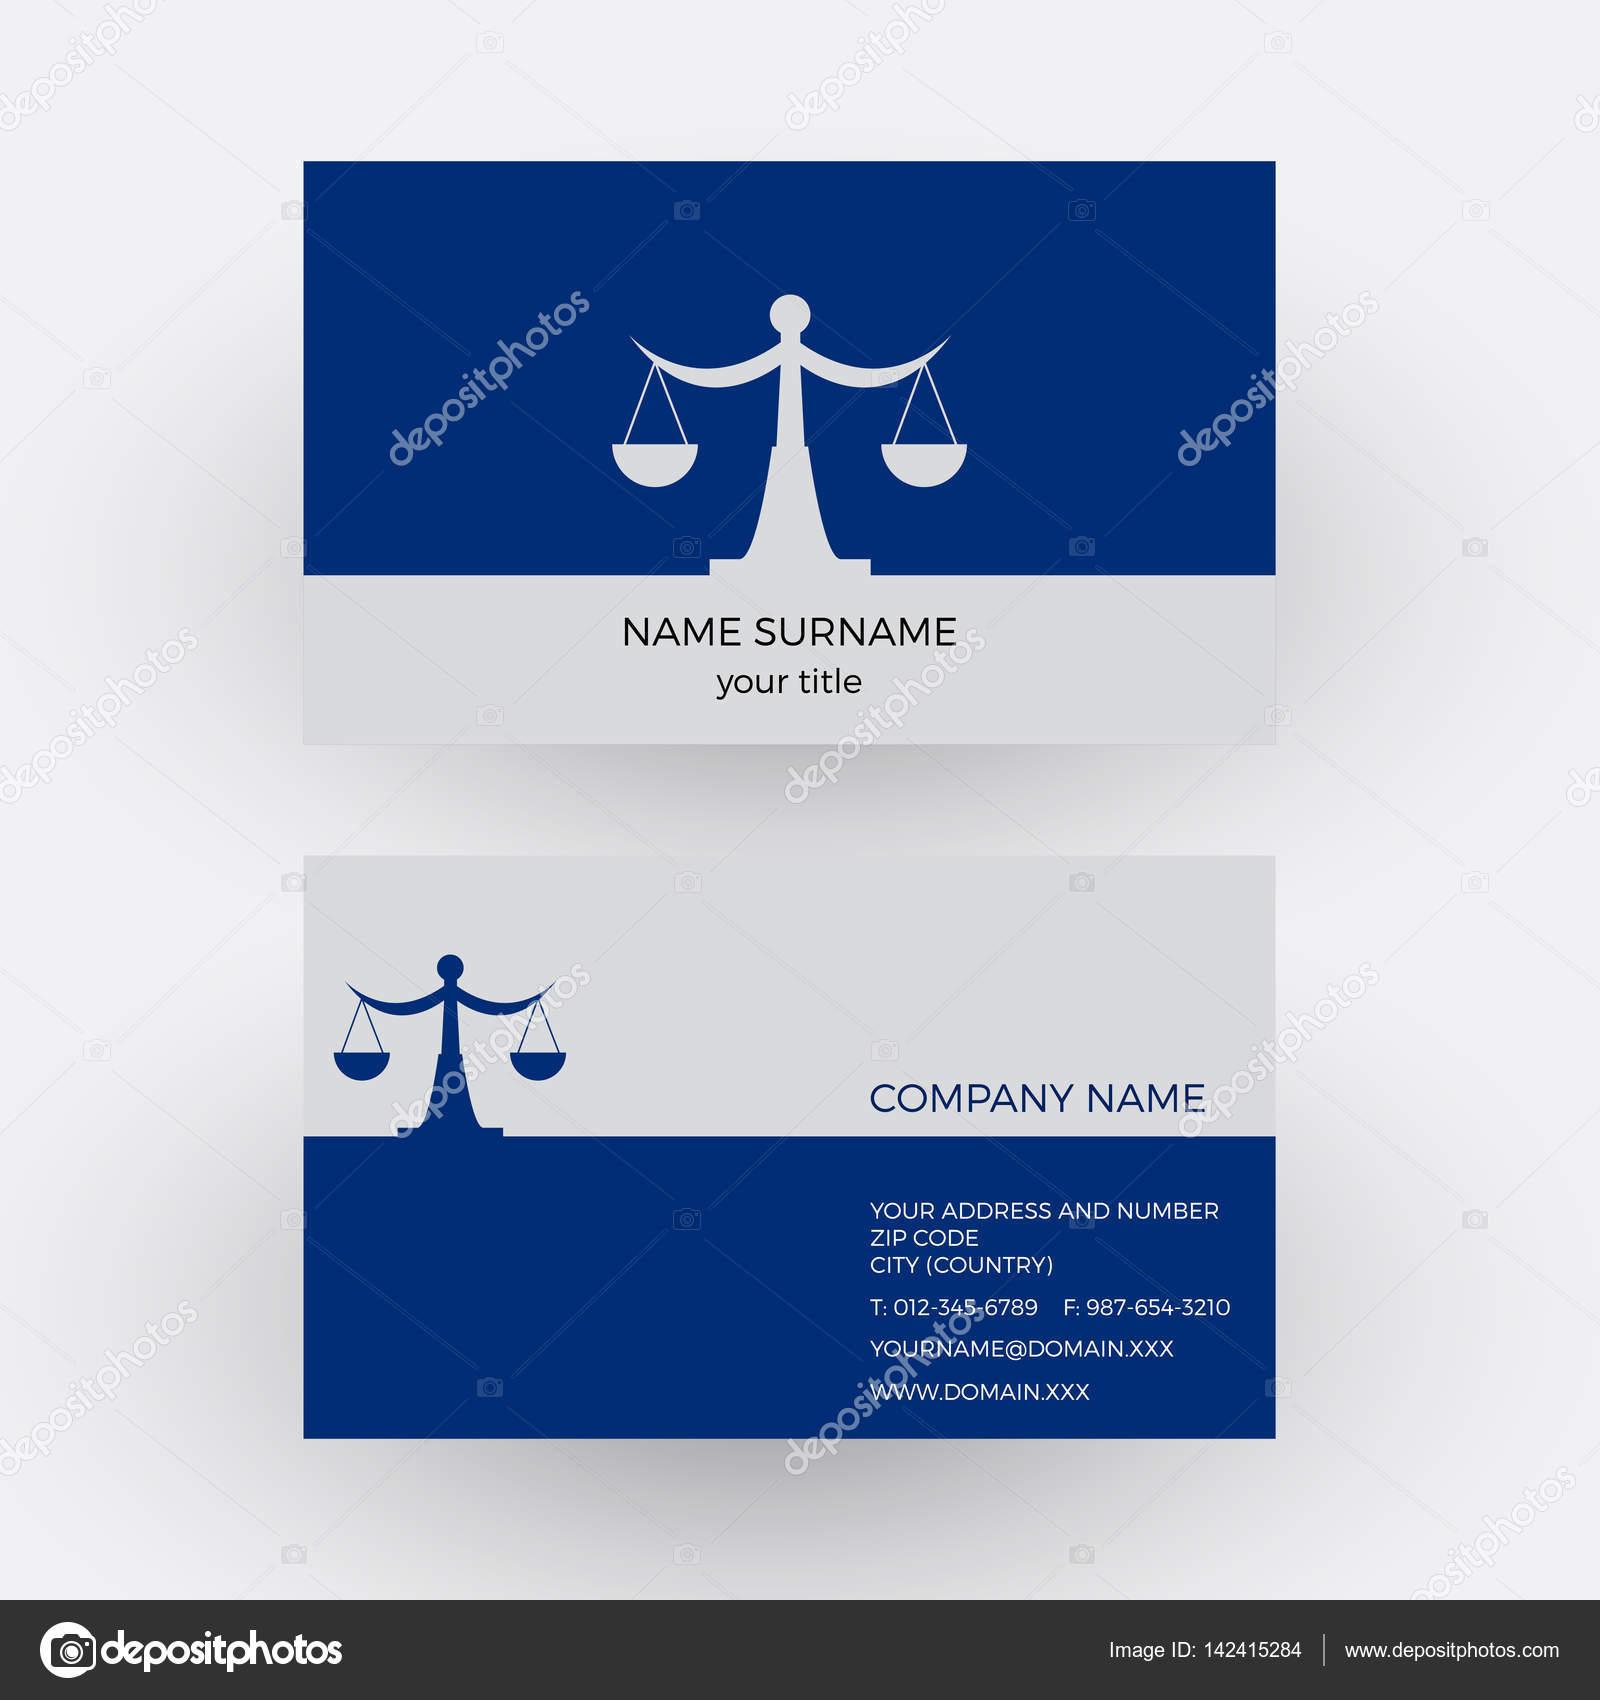 Vektor Abstrakte Waage Und Waage Rechtsanwalt Visitenkarte